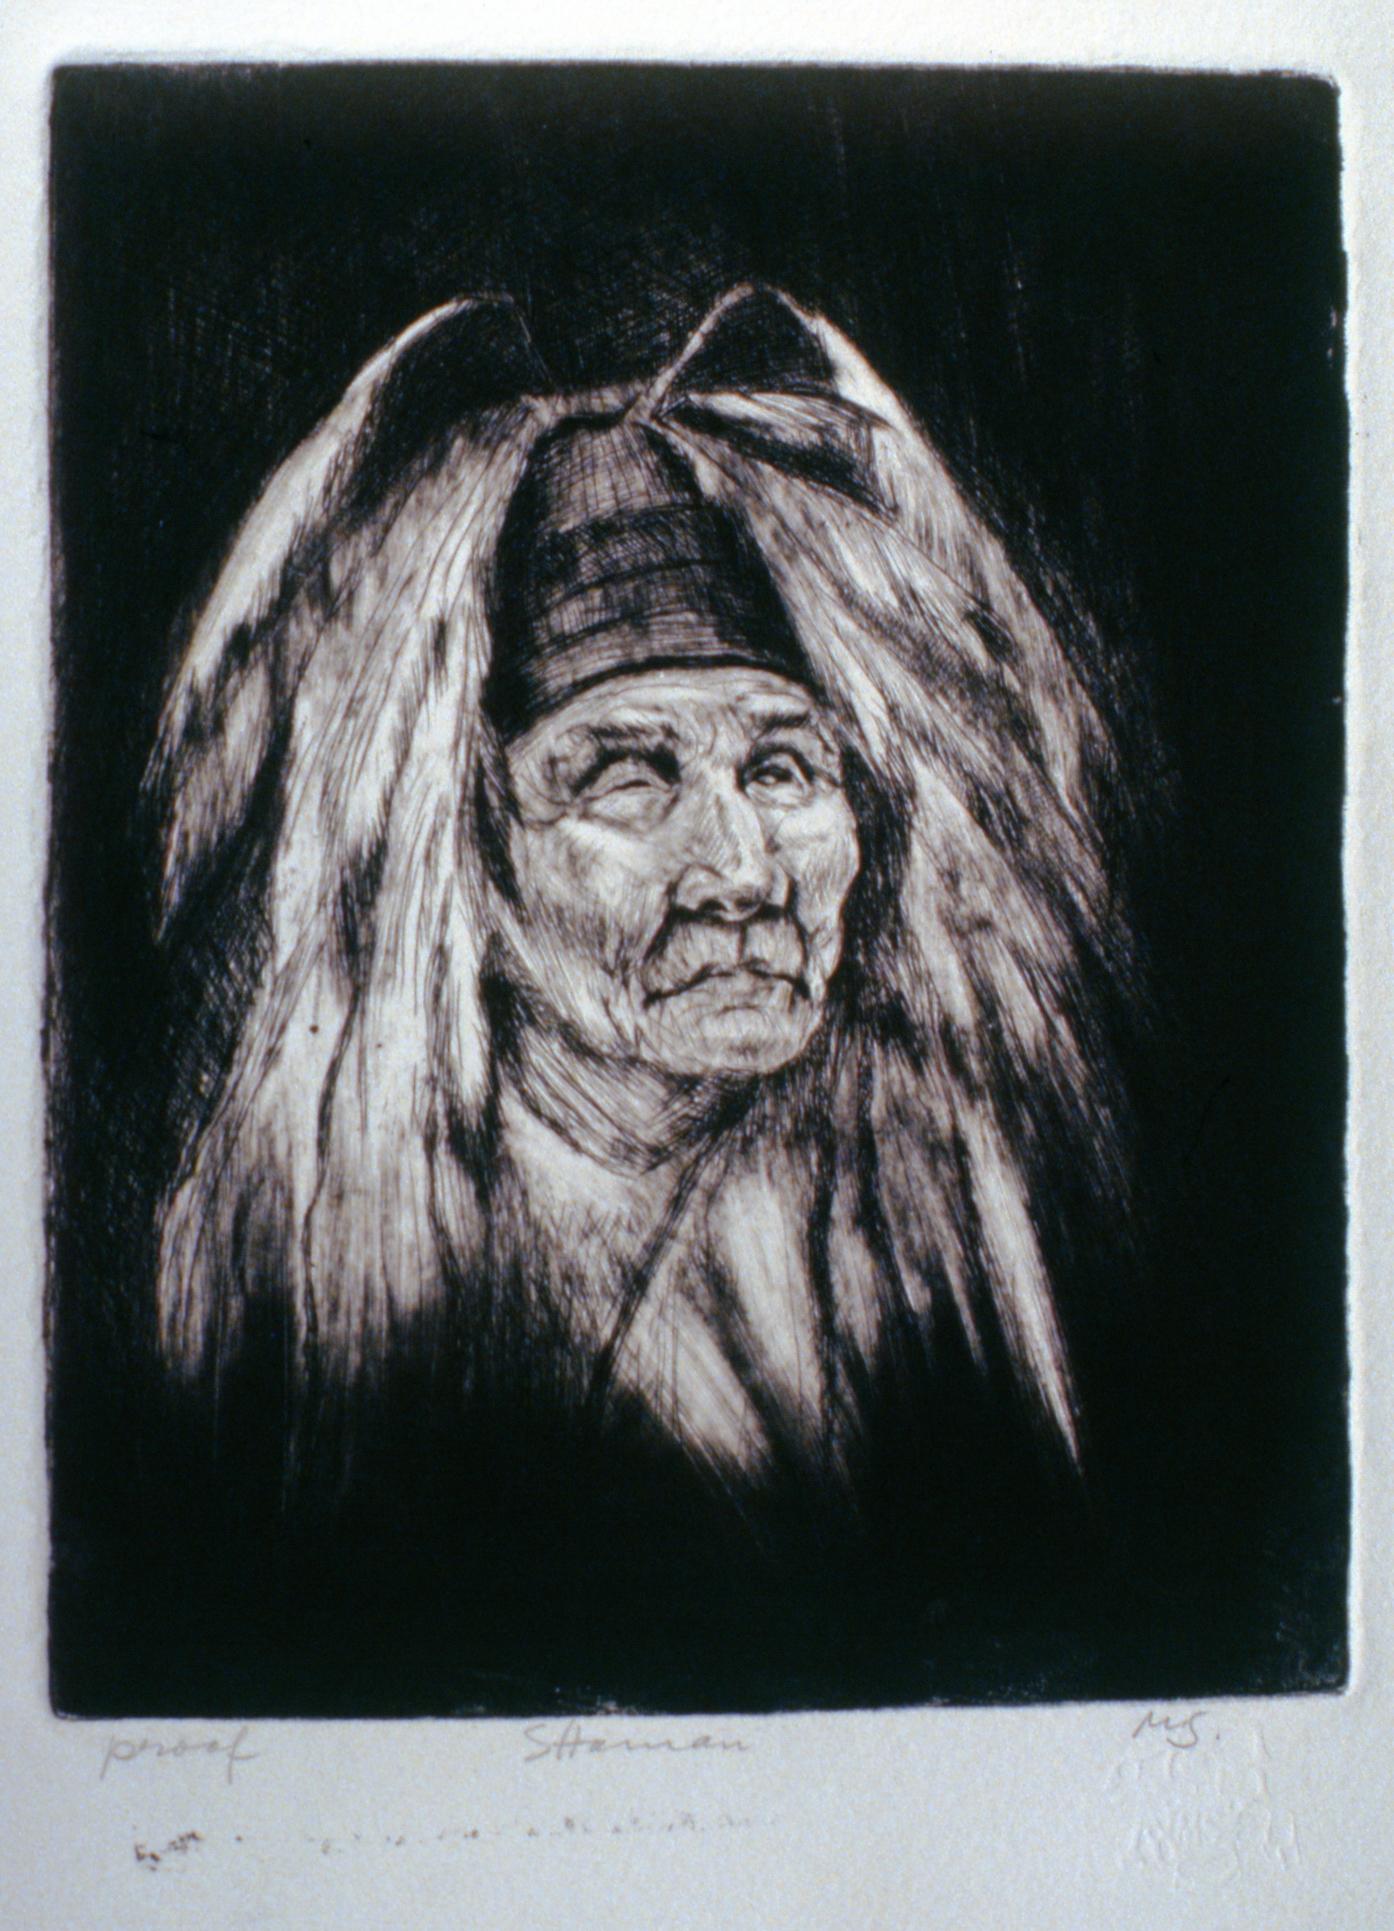 Shaman , 1980, Minn Sjølseth, artist proof, 25 x 20 cm, 1996.02.08